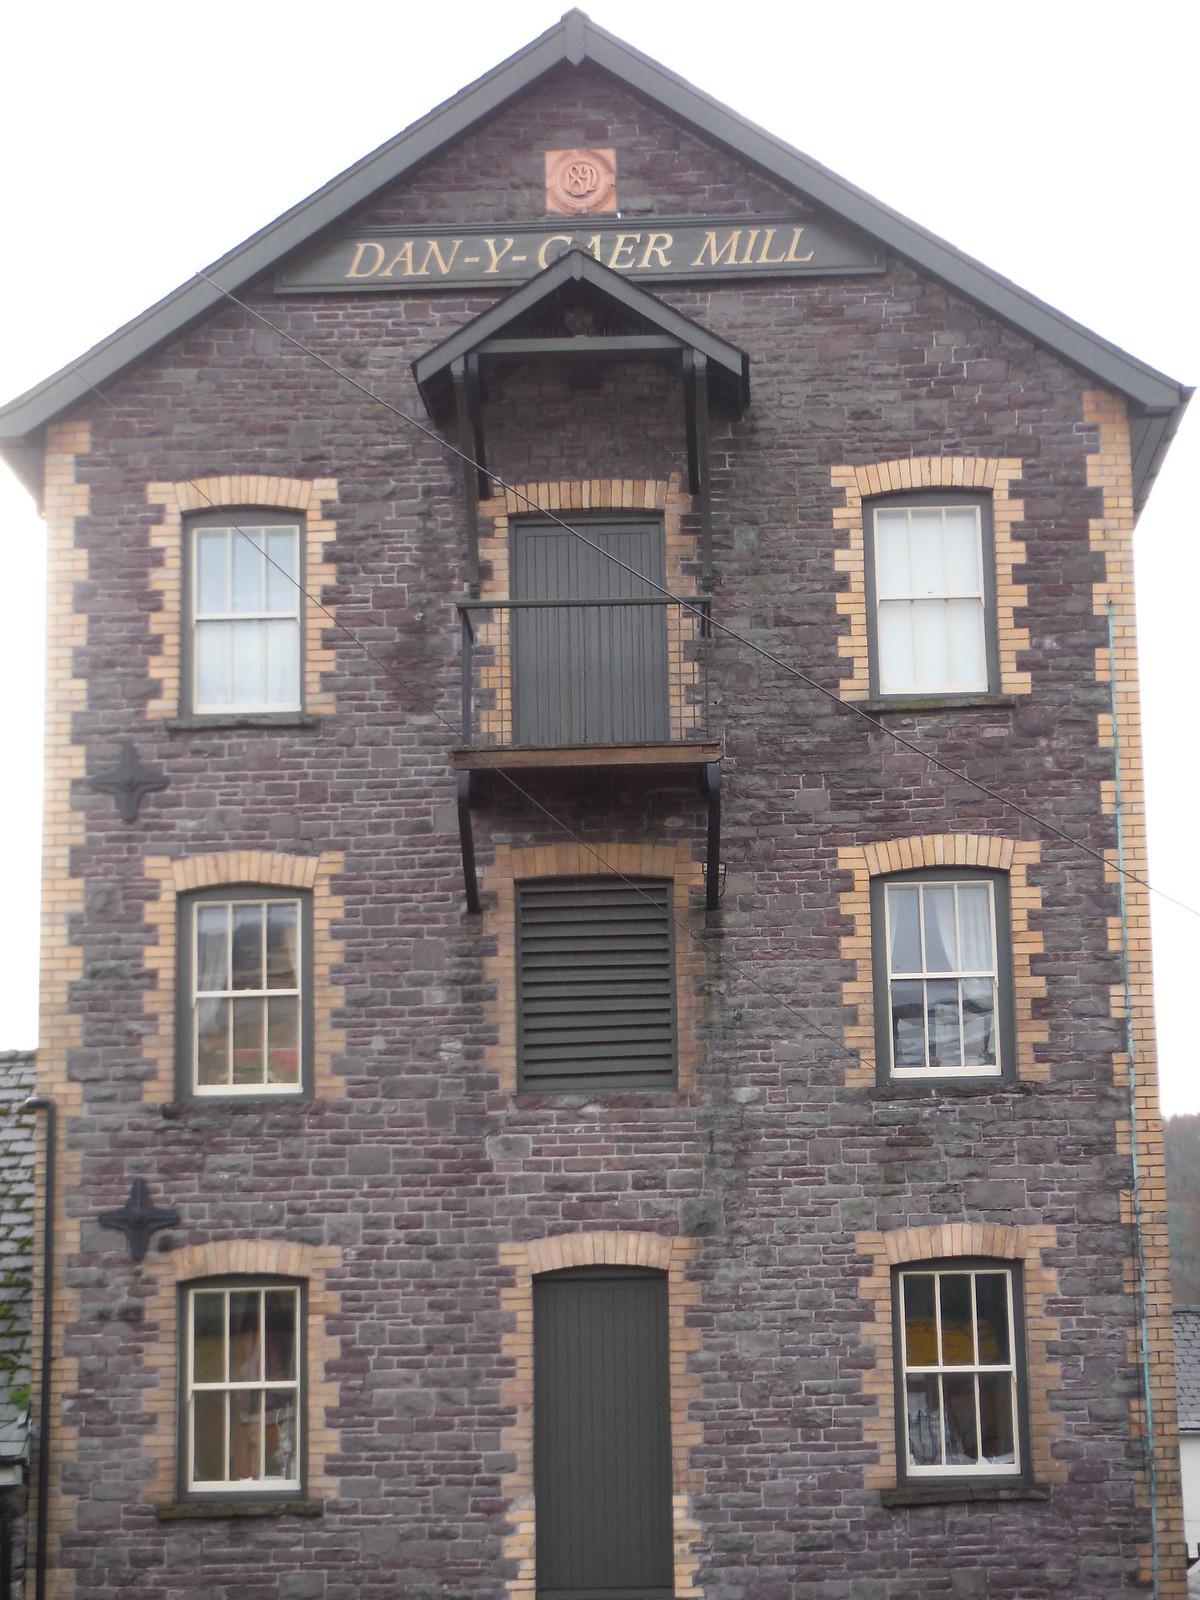 Dan-Y-Gaer Mill SWC Walk 306 - Brecon Circular (via Y Gaer, Battle and Pen-y-crug)